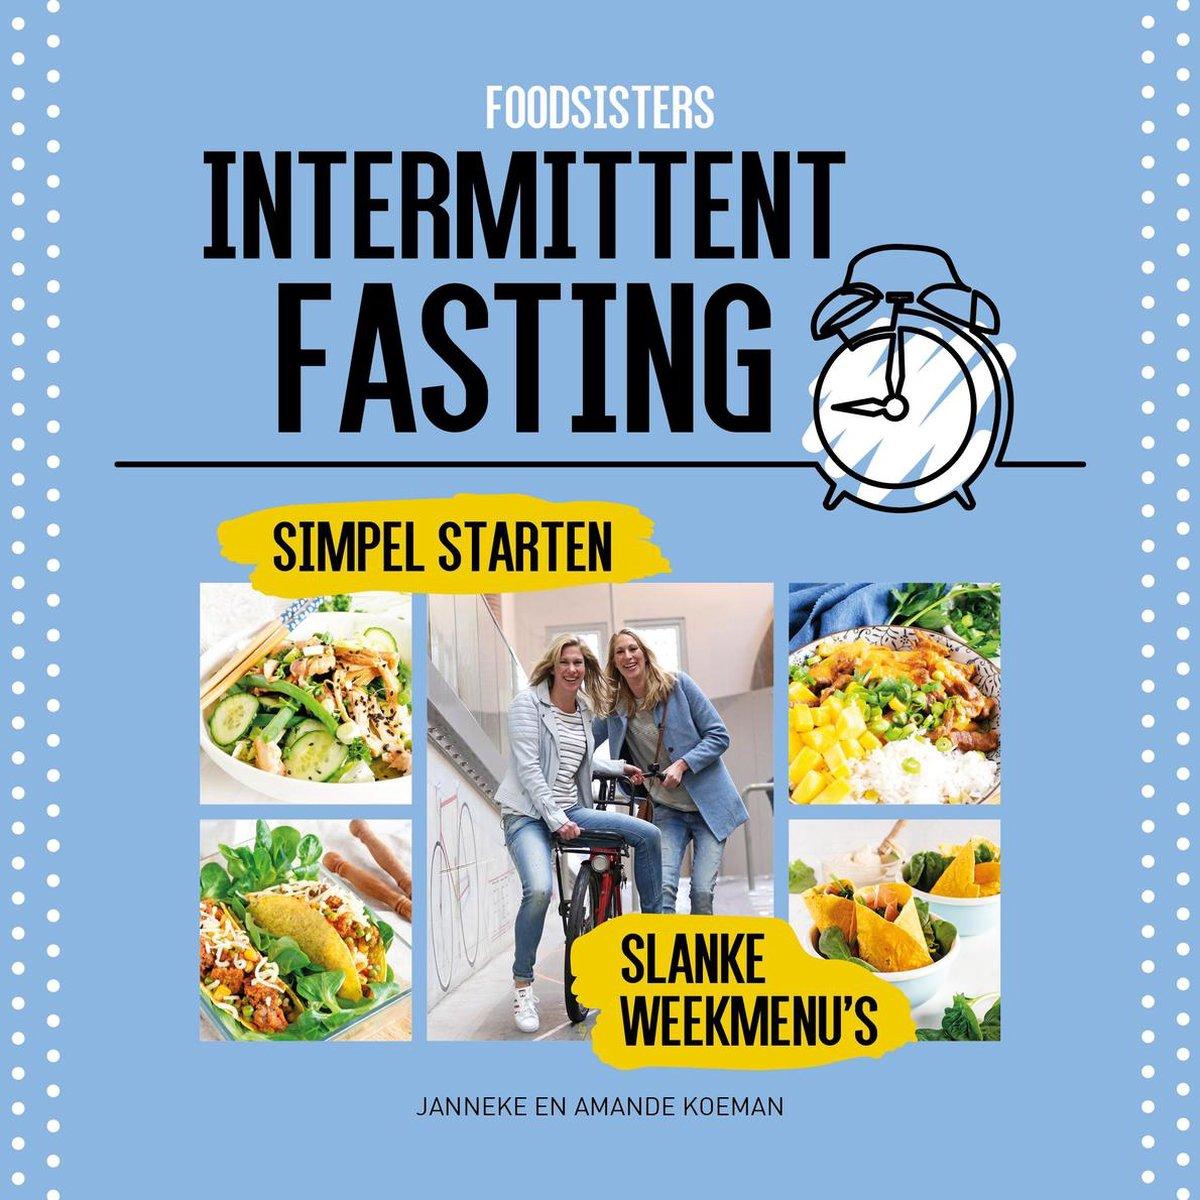 Foodsisters - Intermittent fasting - Janneke Koeman